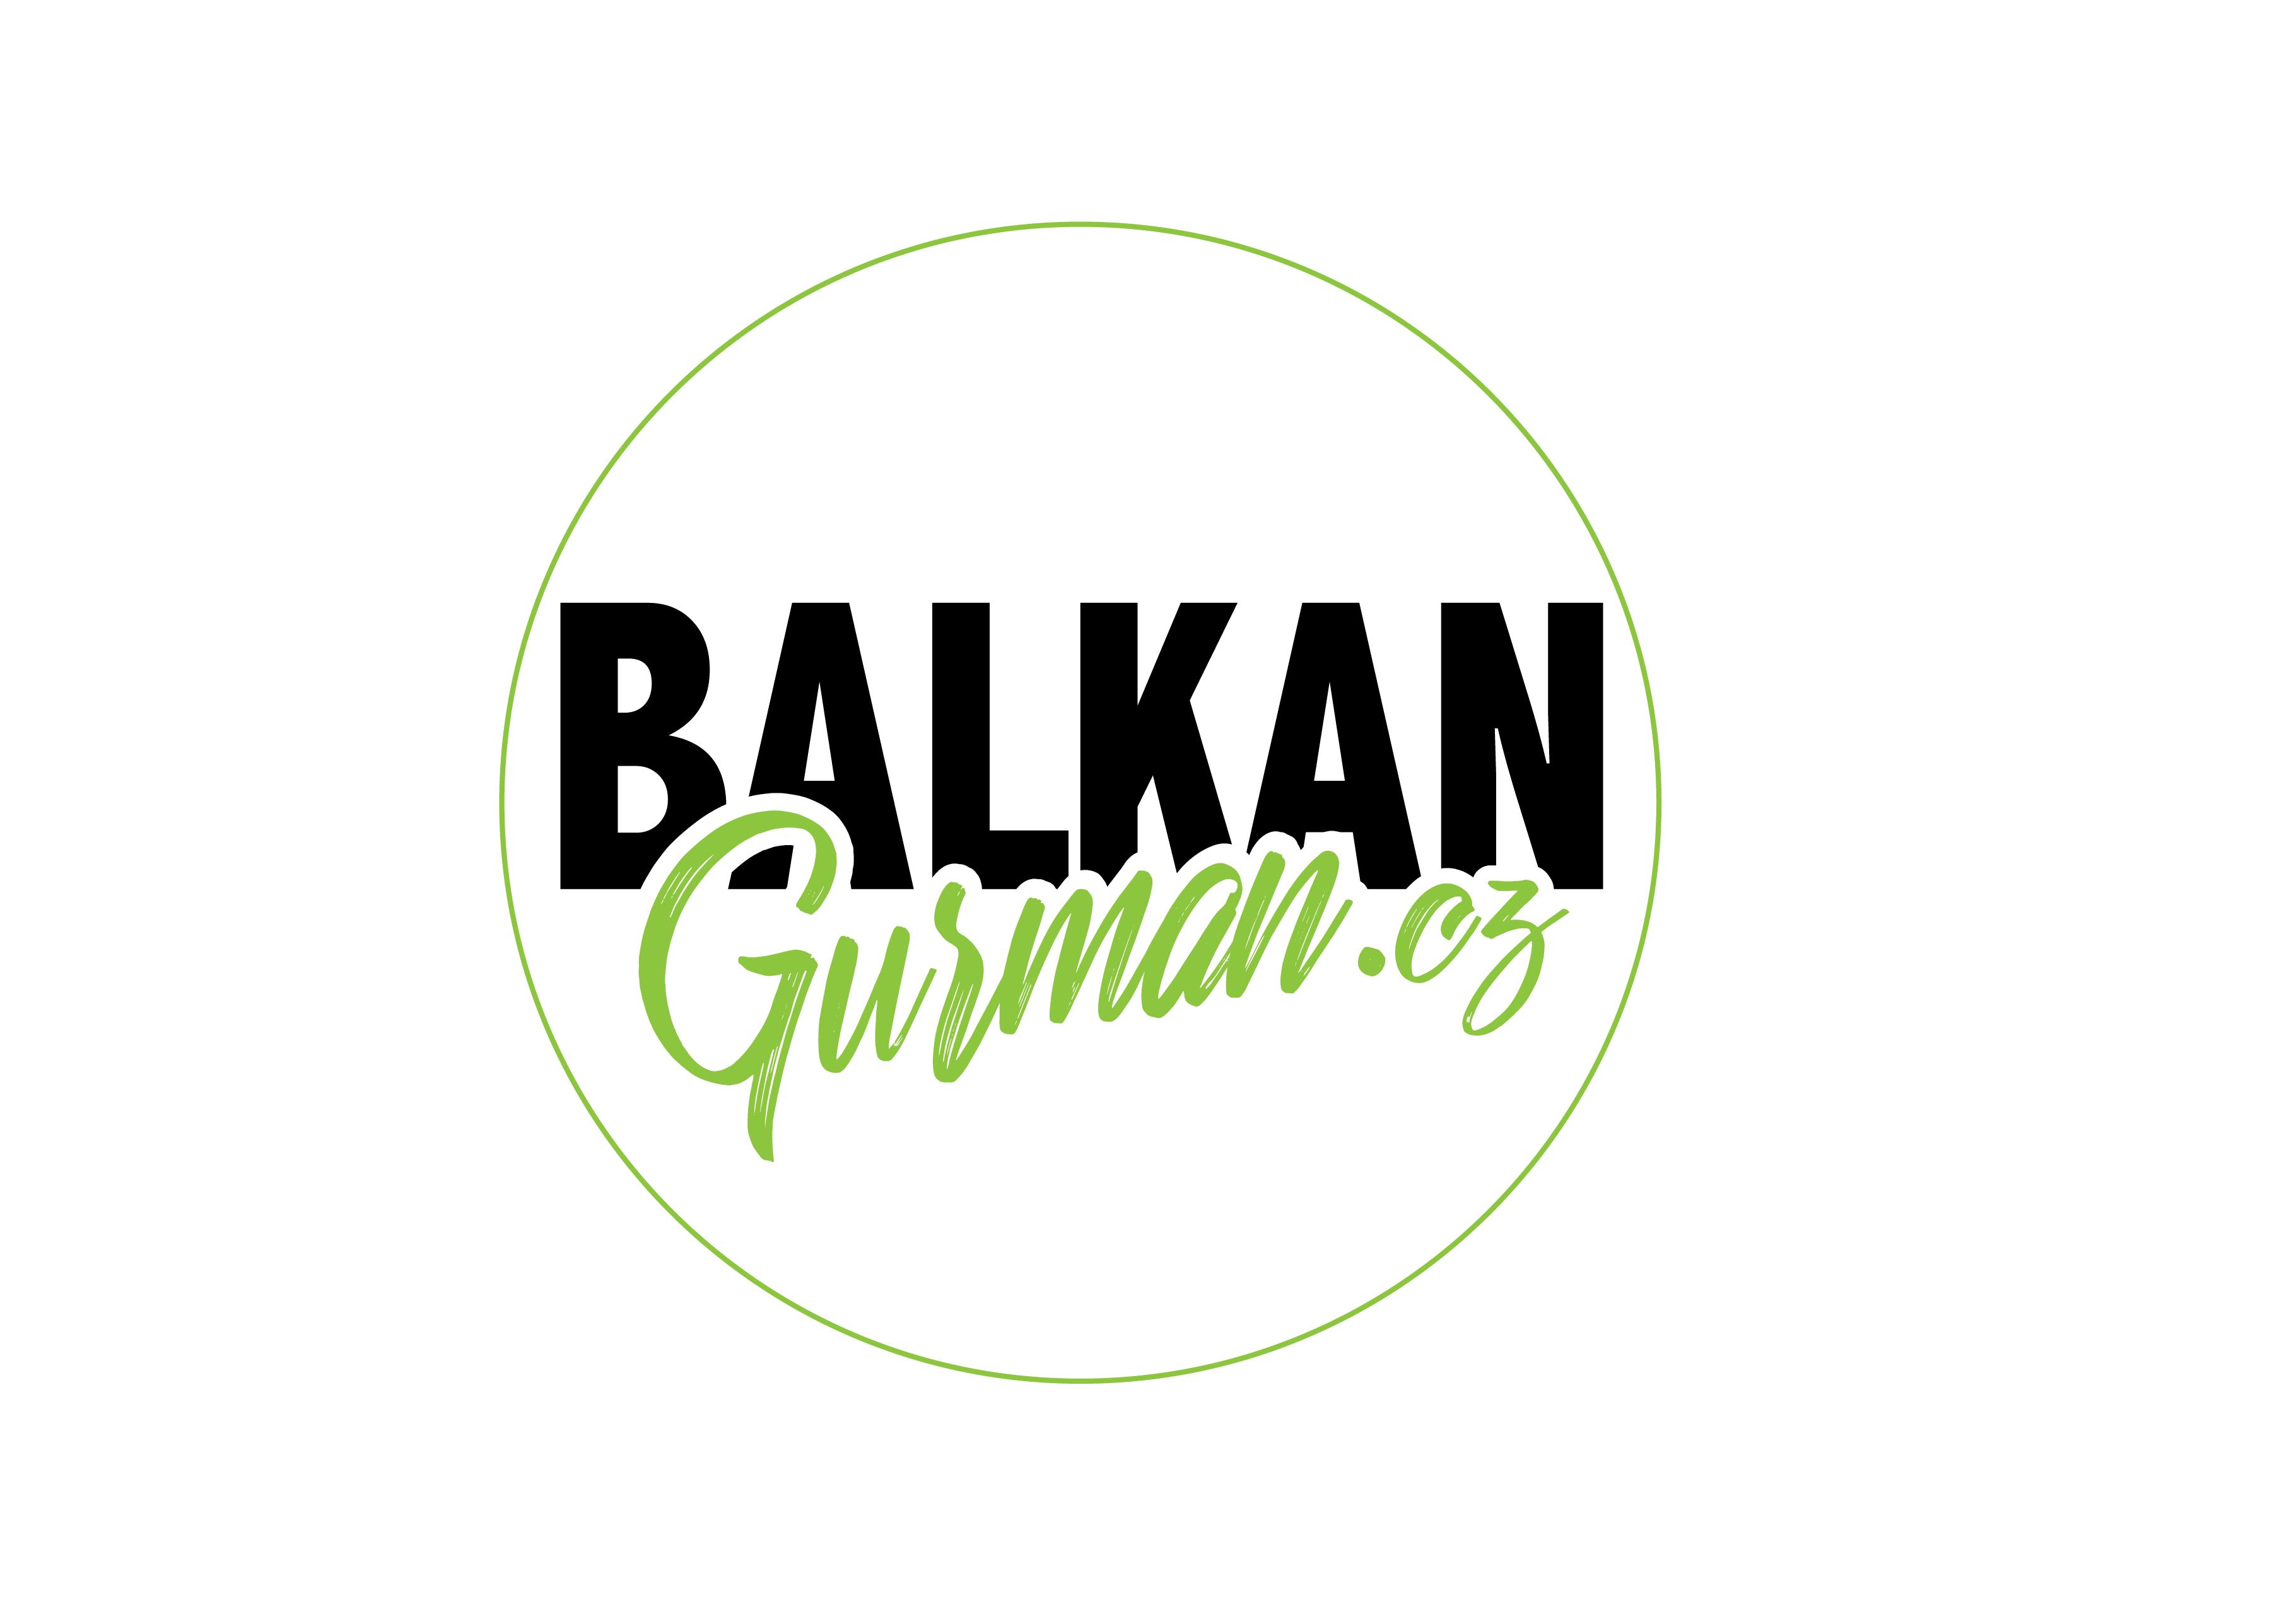 BALKAN GURMAN.cz